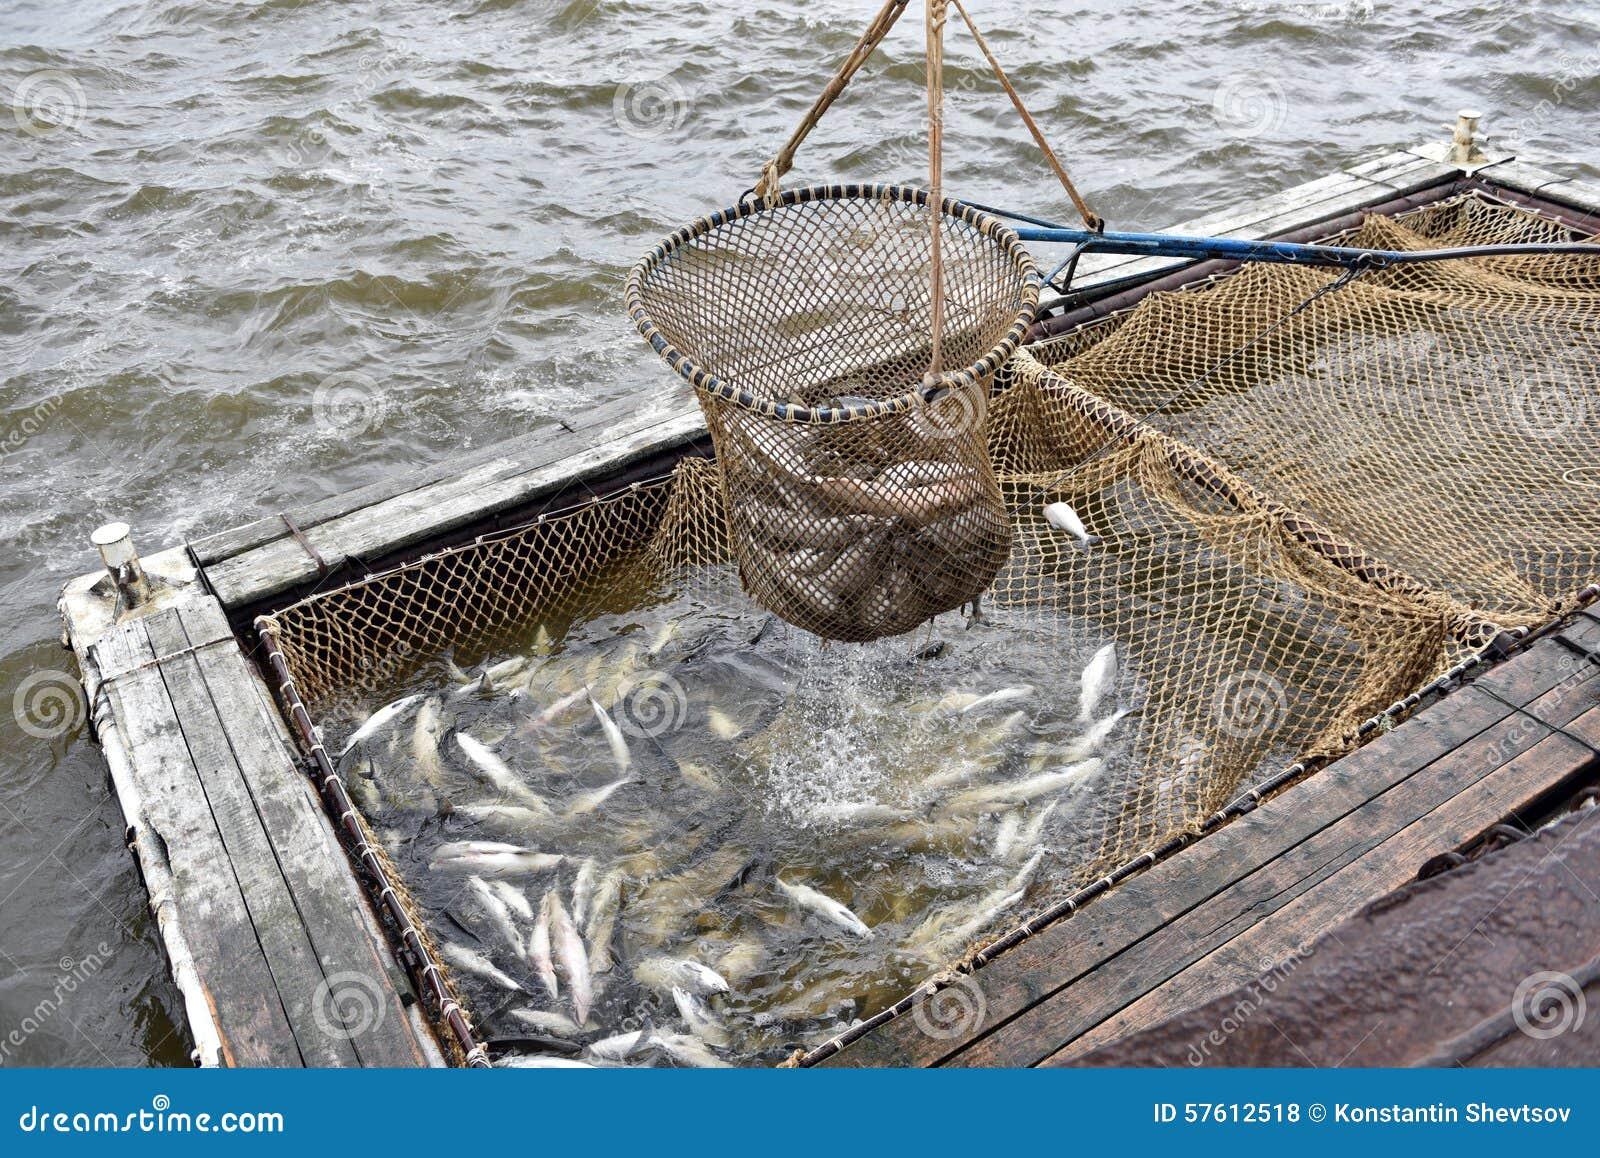 Salmon fishing season stock photo image 57612518 for Salmon fishing season